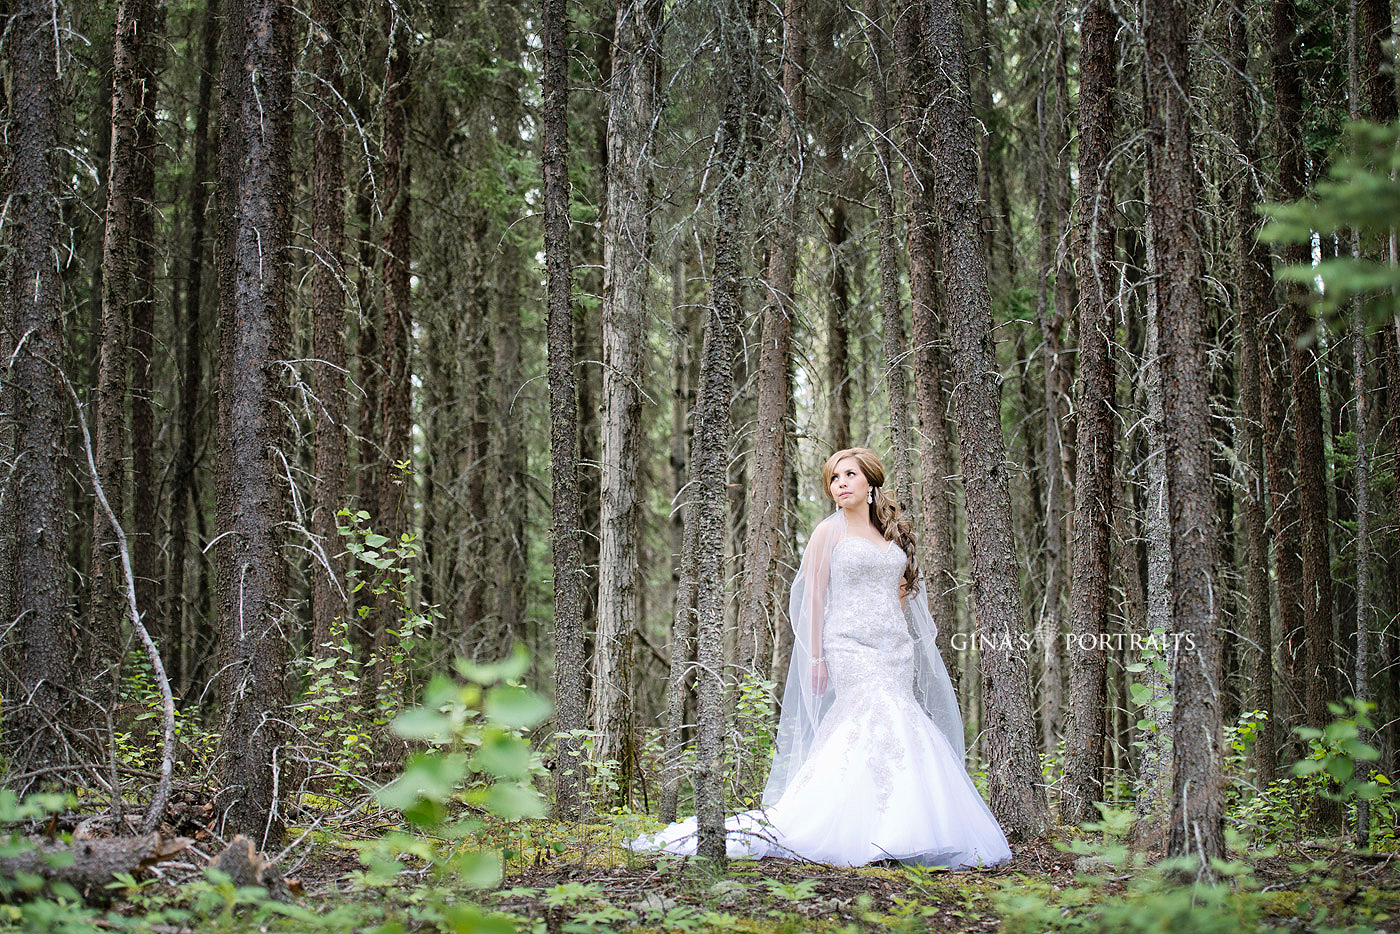 065-Saskatoon_Photographer